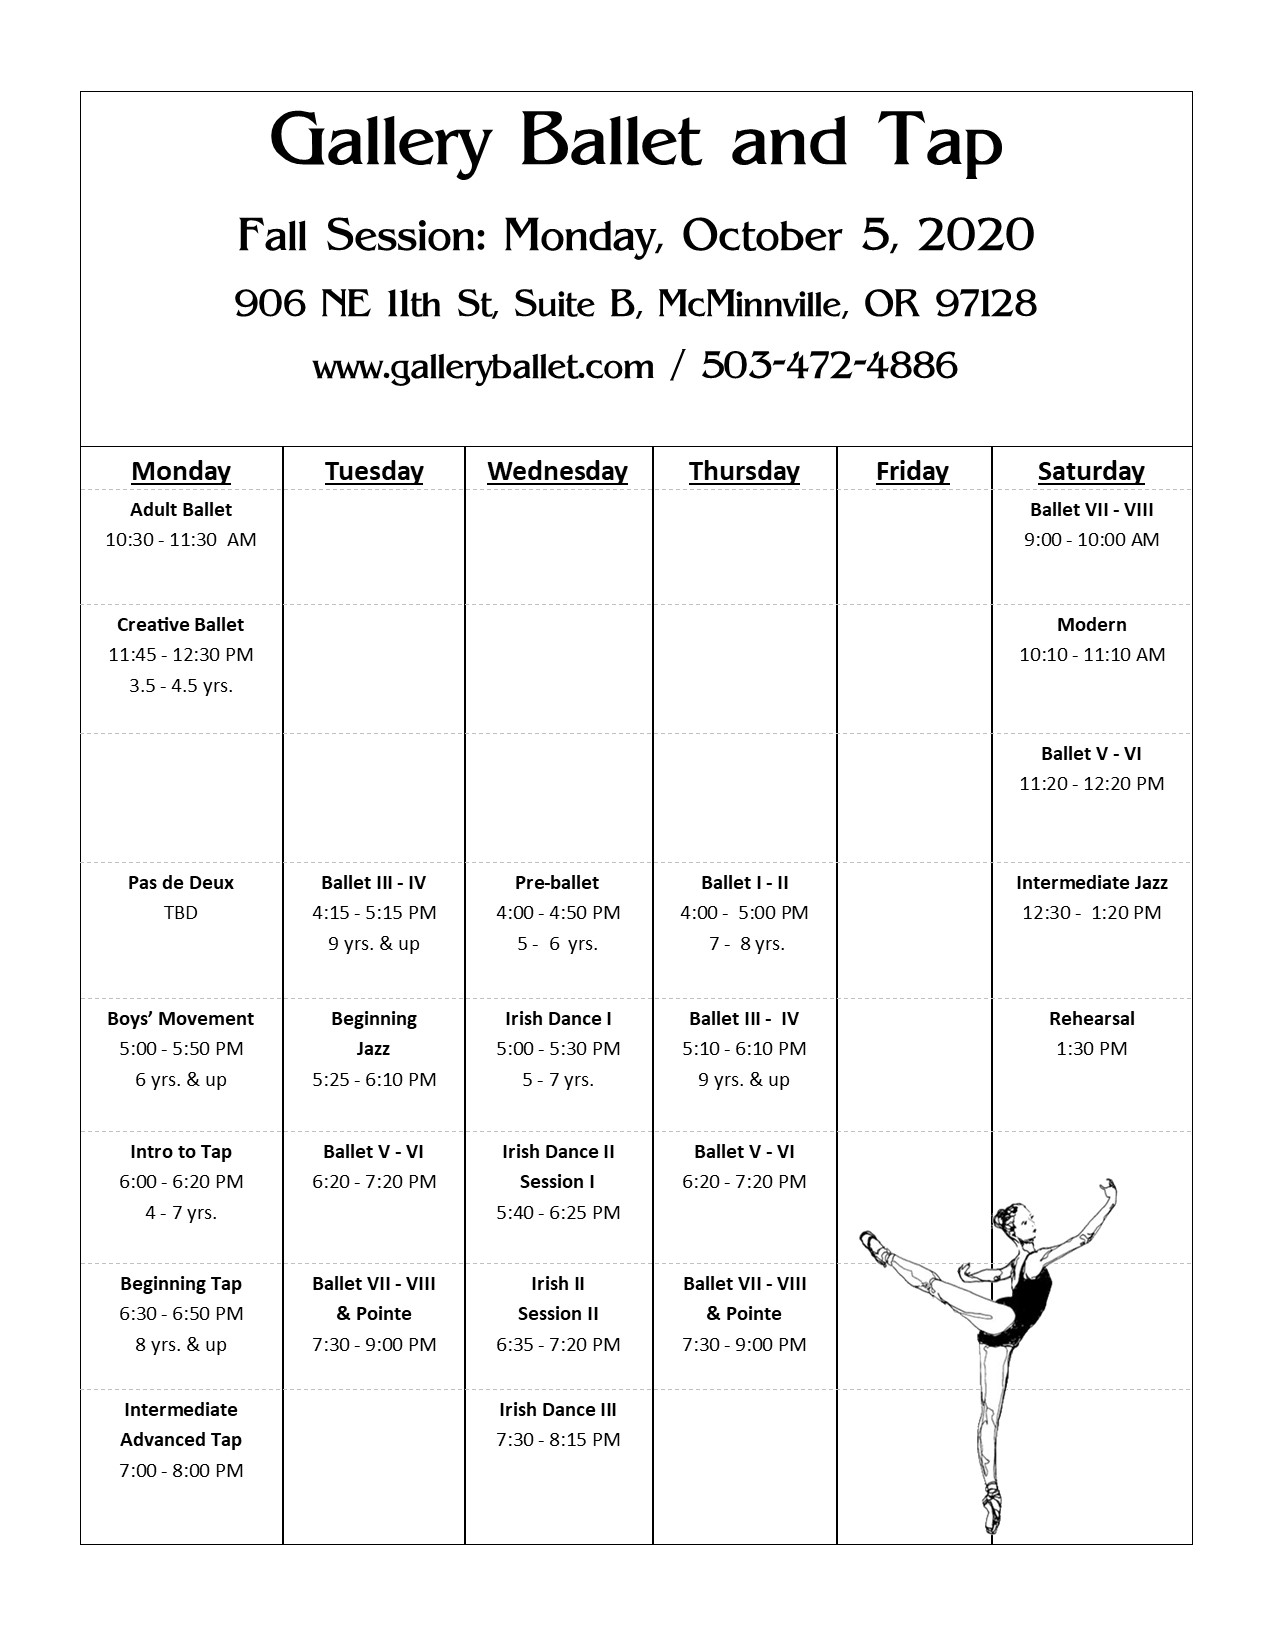 Fall Session 2020